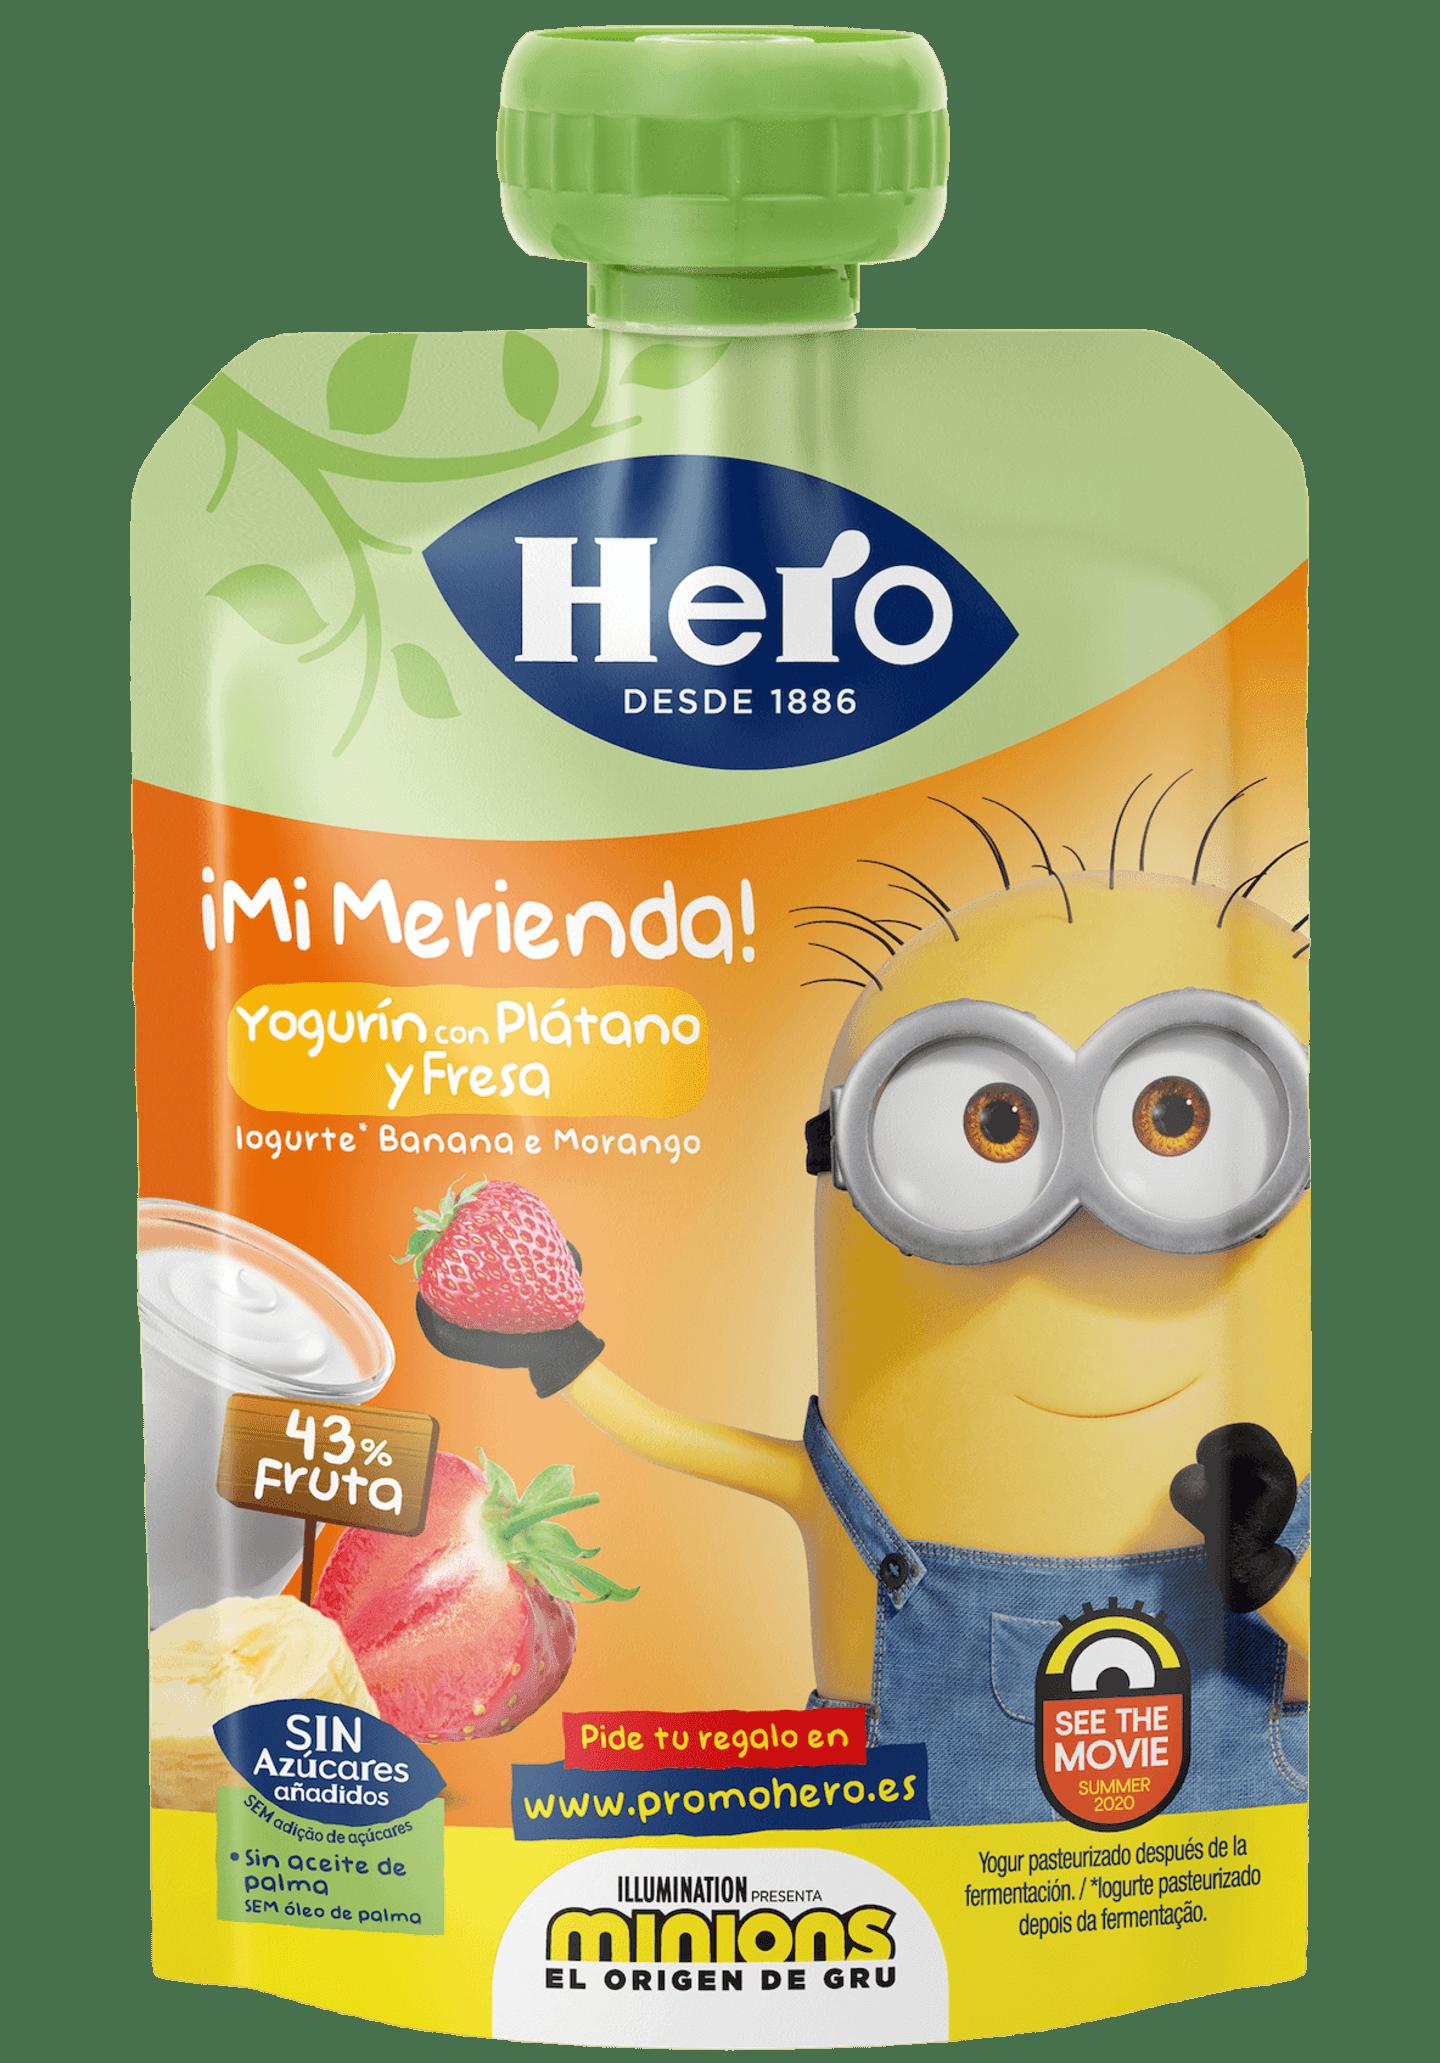 Saqueta Minions Iogurte, Banana e Morango